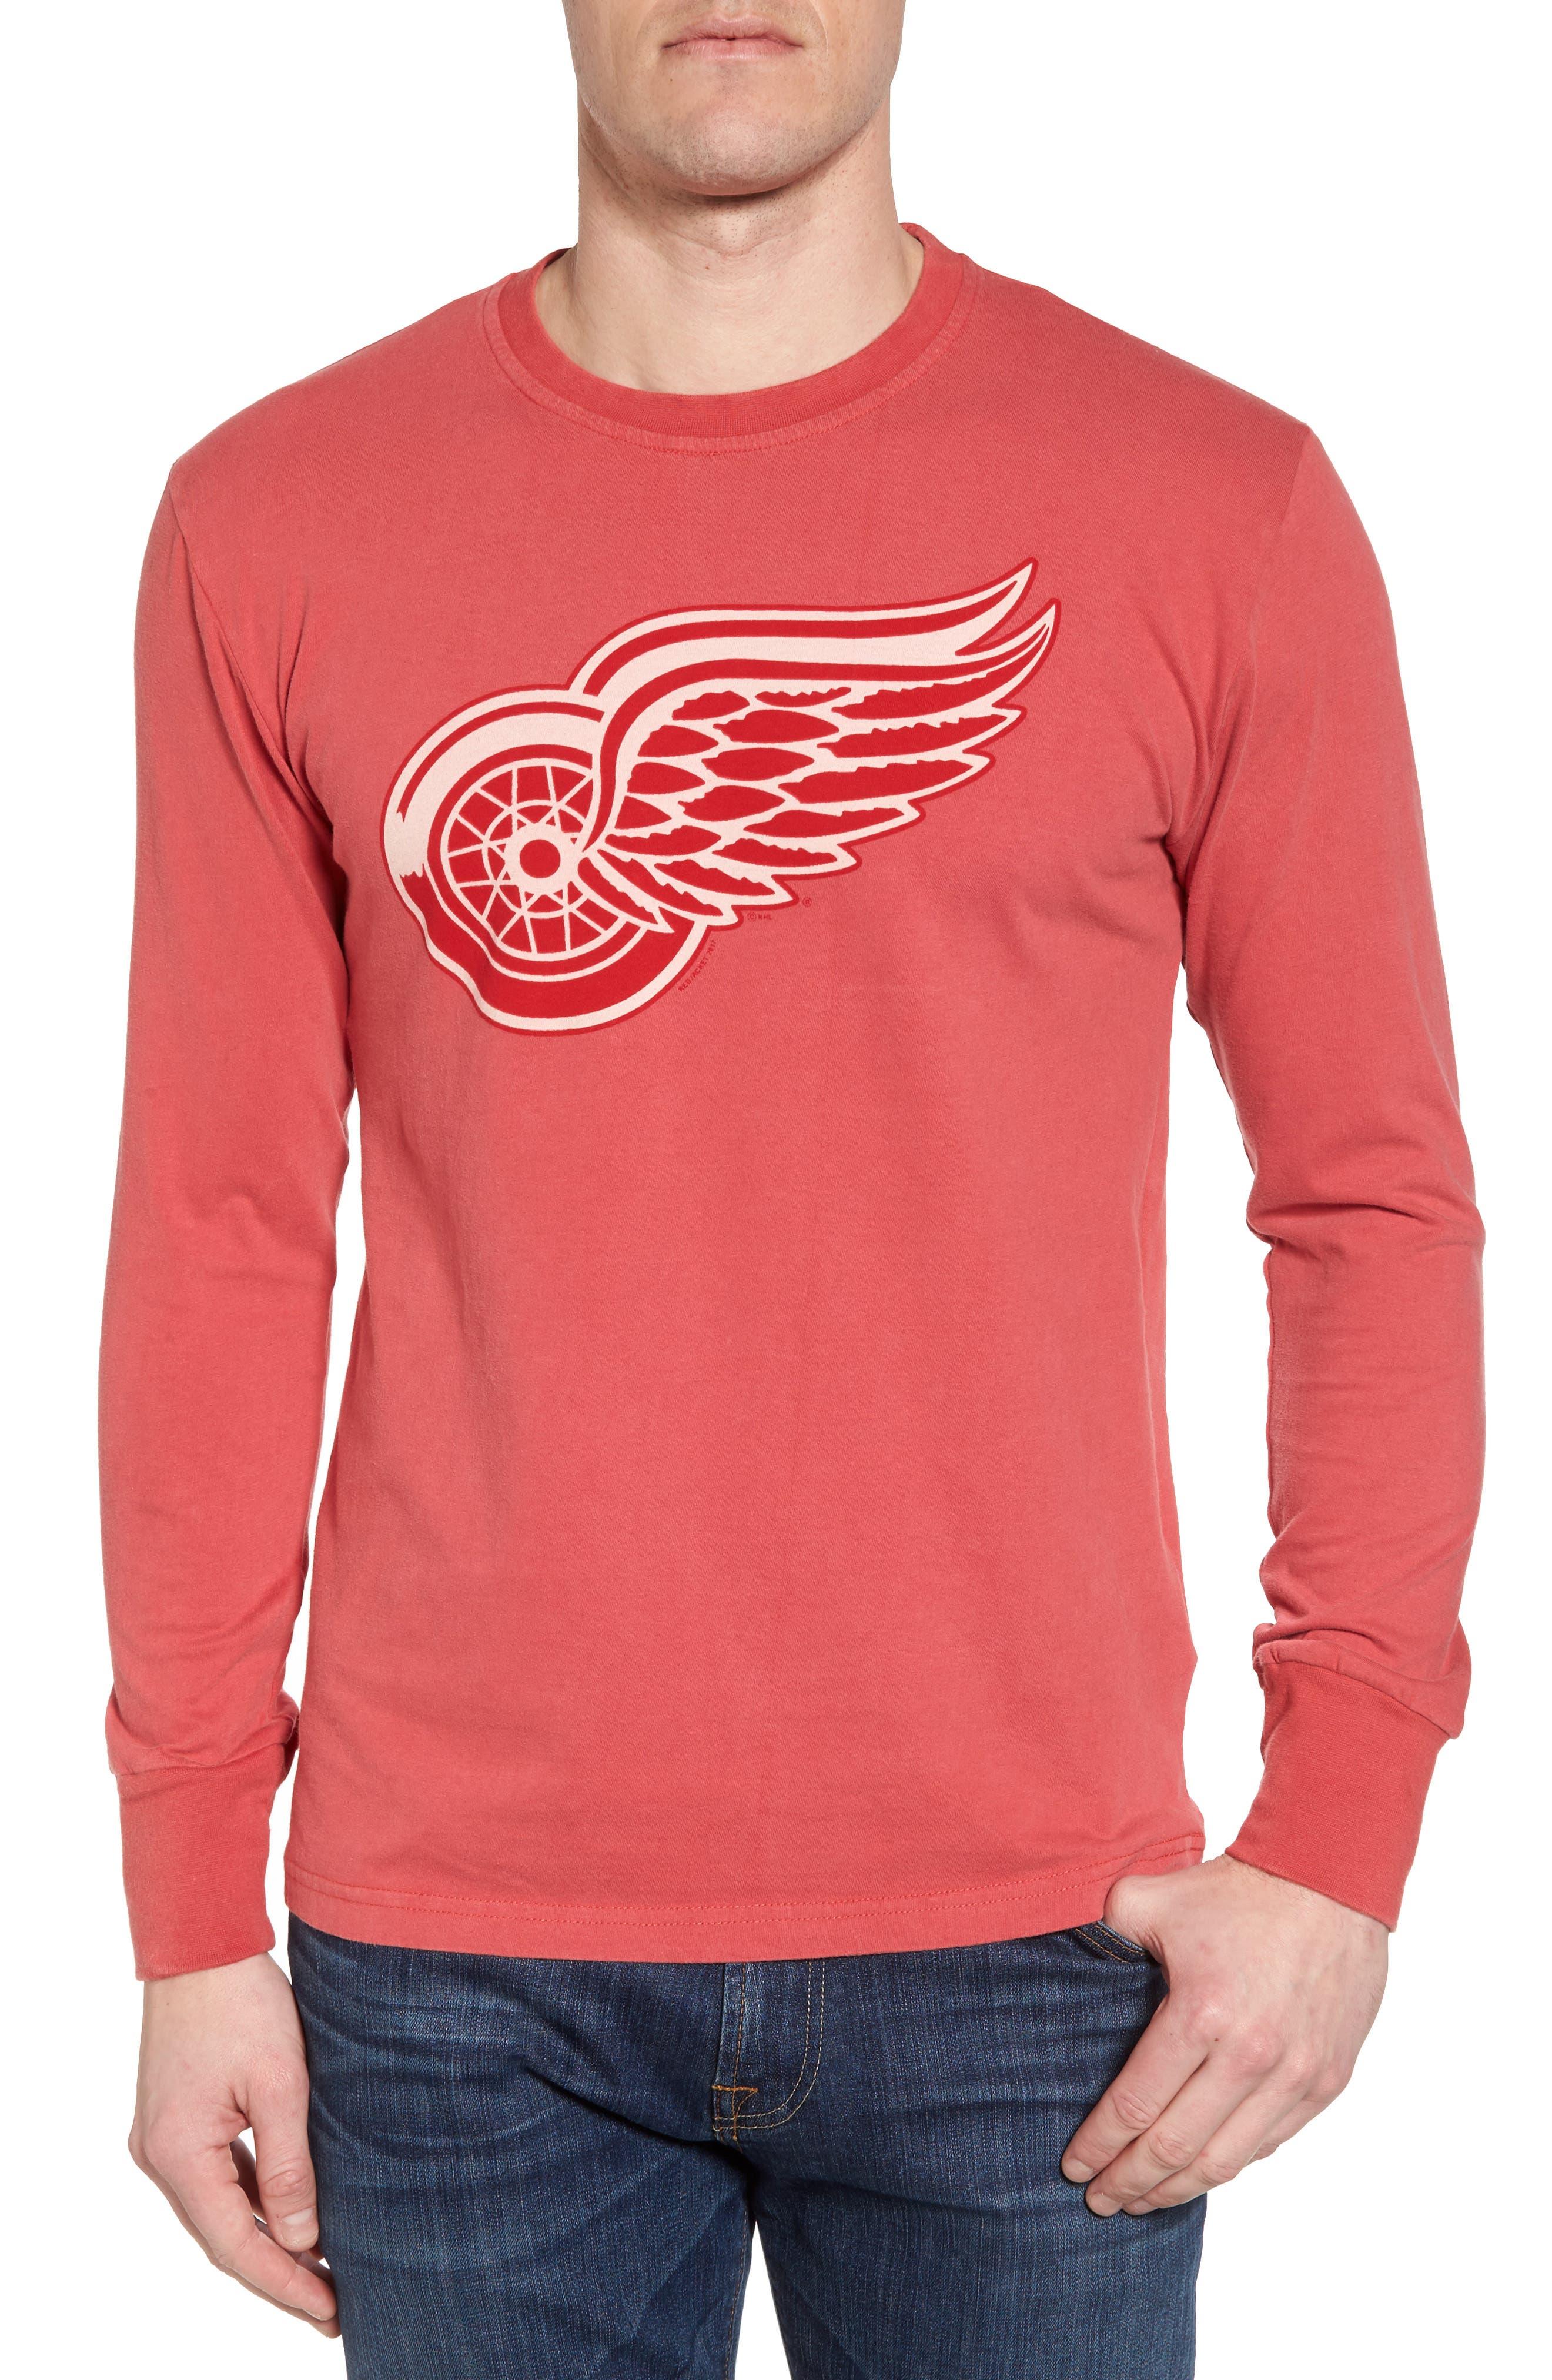 American Needle Gresham Red Wings T-Shirt